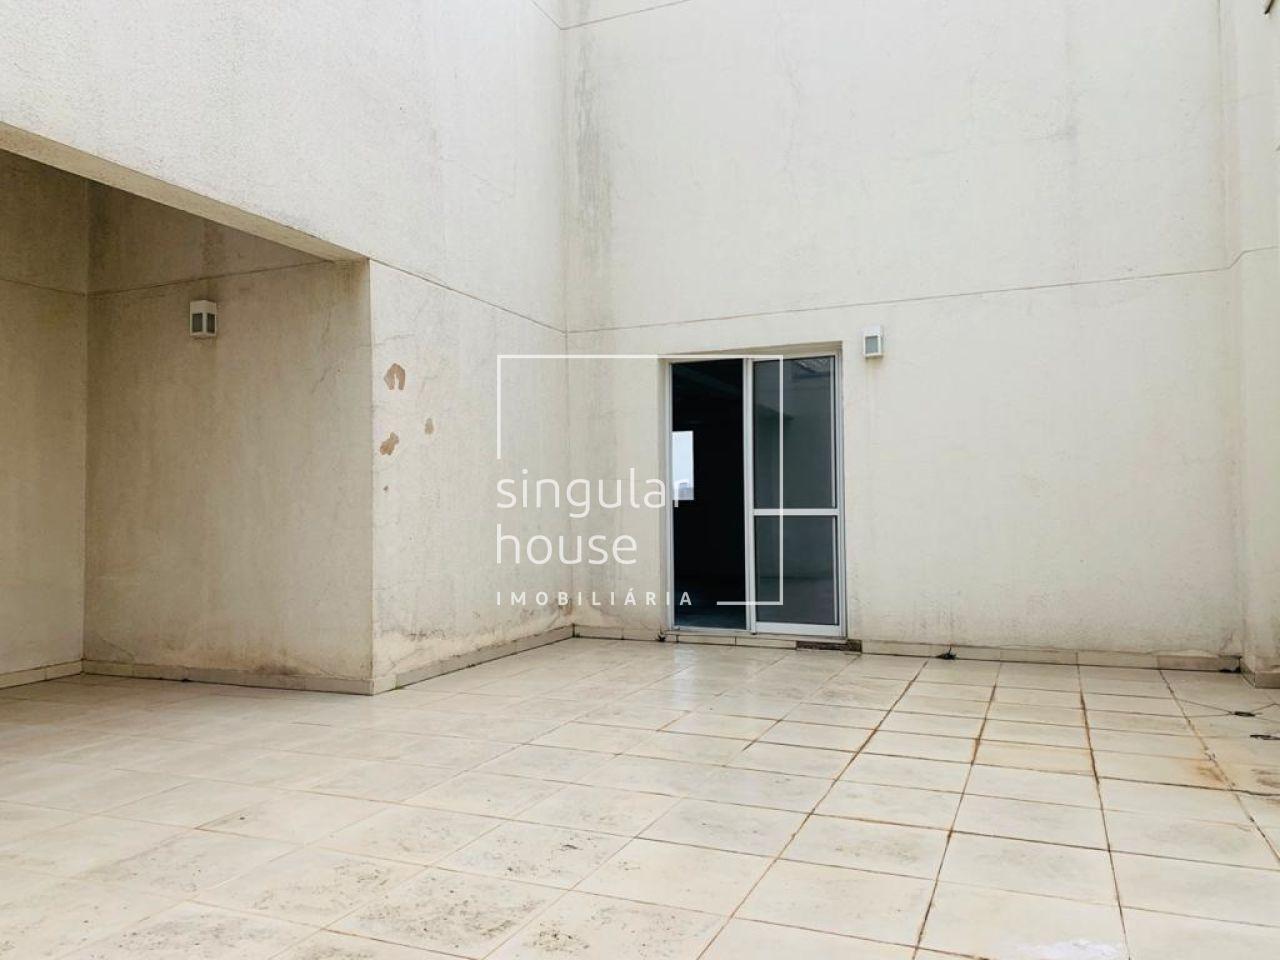 SALA COMERCIAL 14² m² | 3 vagas garagem | cobertura